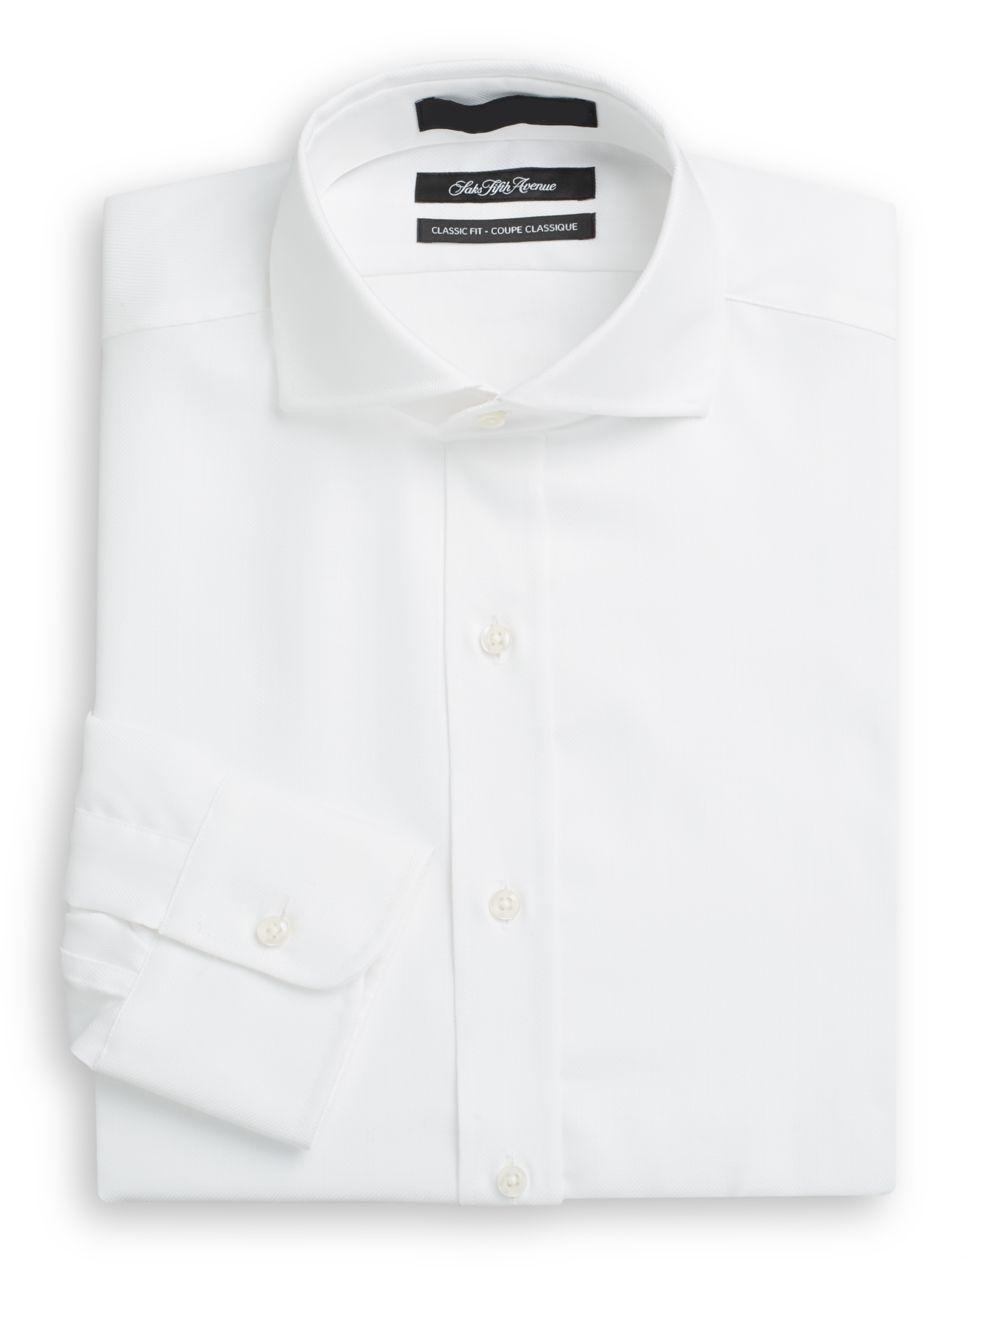 Saks fifth avenue classic fit herringbone dress shirt in for White herringbone dress shirt